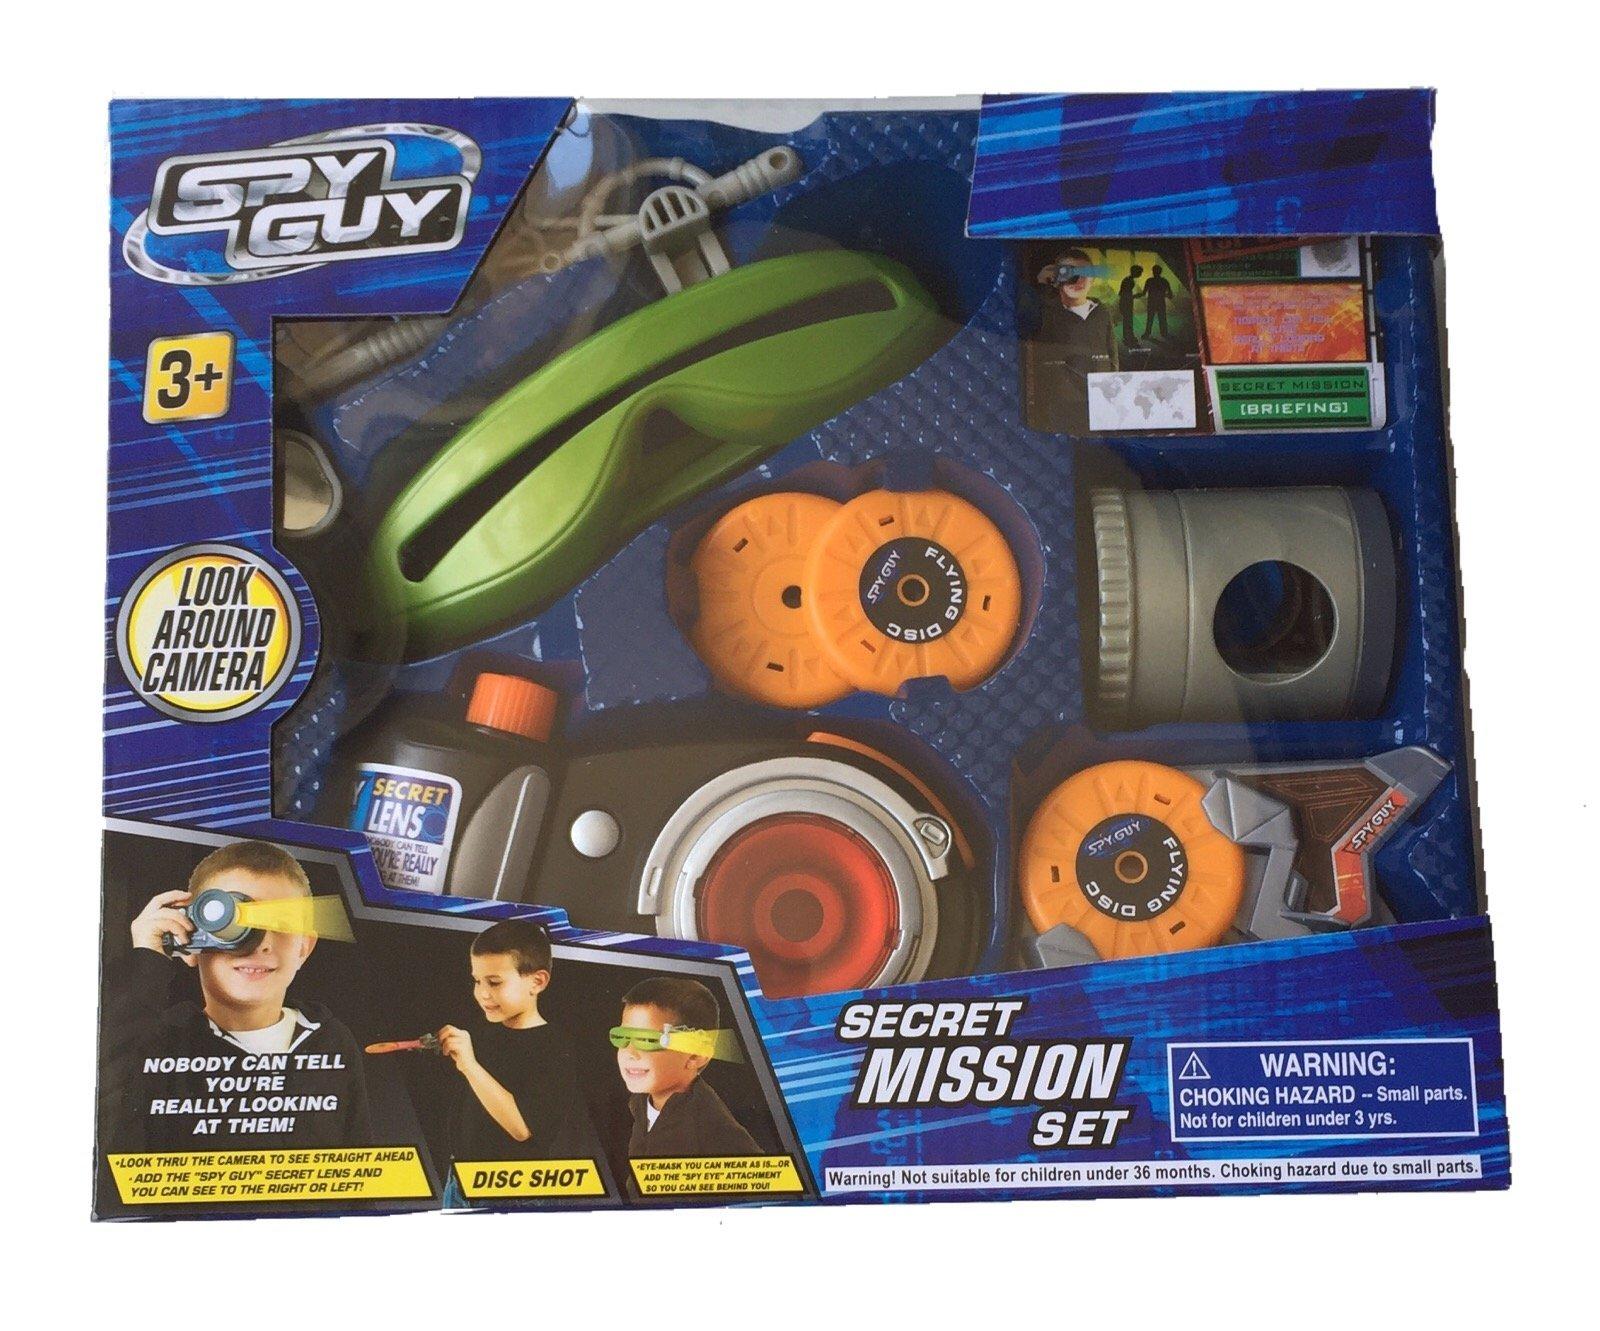 Spy Guy 10 Piece Toy Secret Mission Set with Look